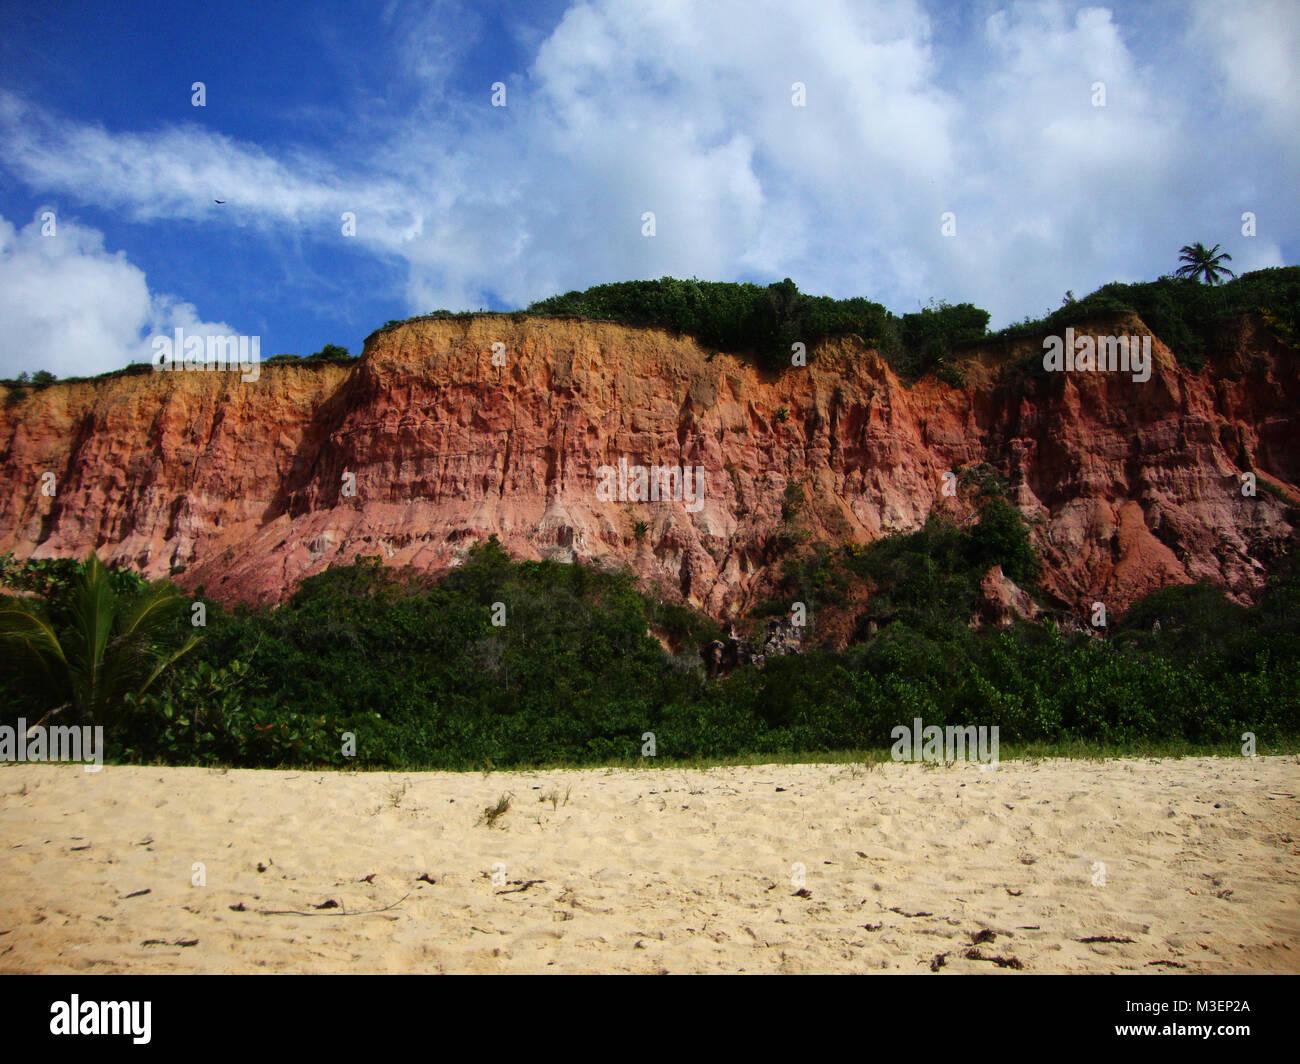 Travel Agency Tropical Paradise Vacation Stock Photos & Travel